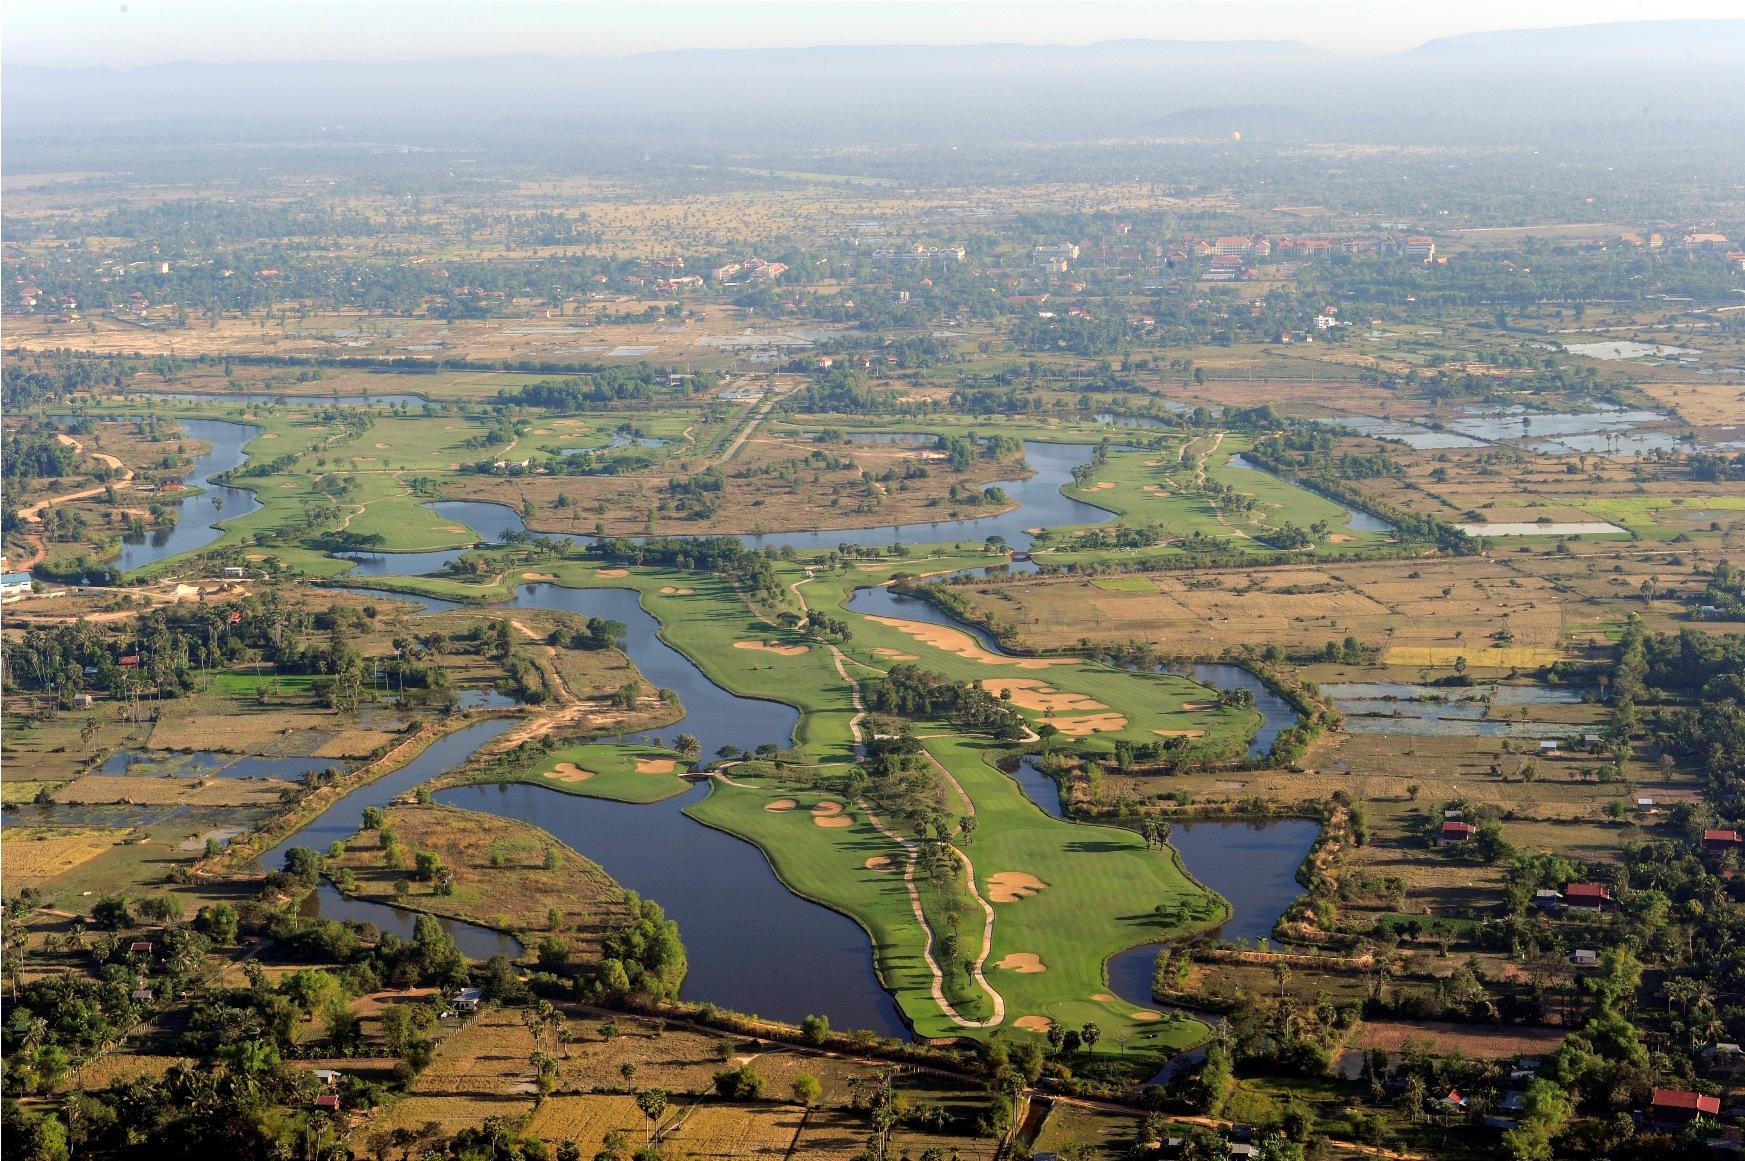 https://bubo.sk/uploads/galleries/7382/angkor-golf-resort-07.jpg